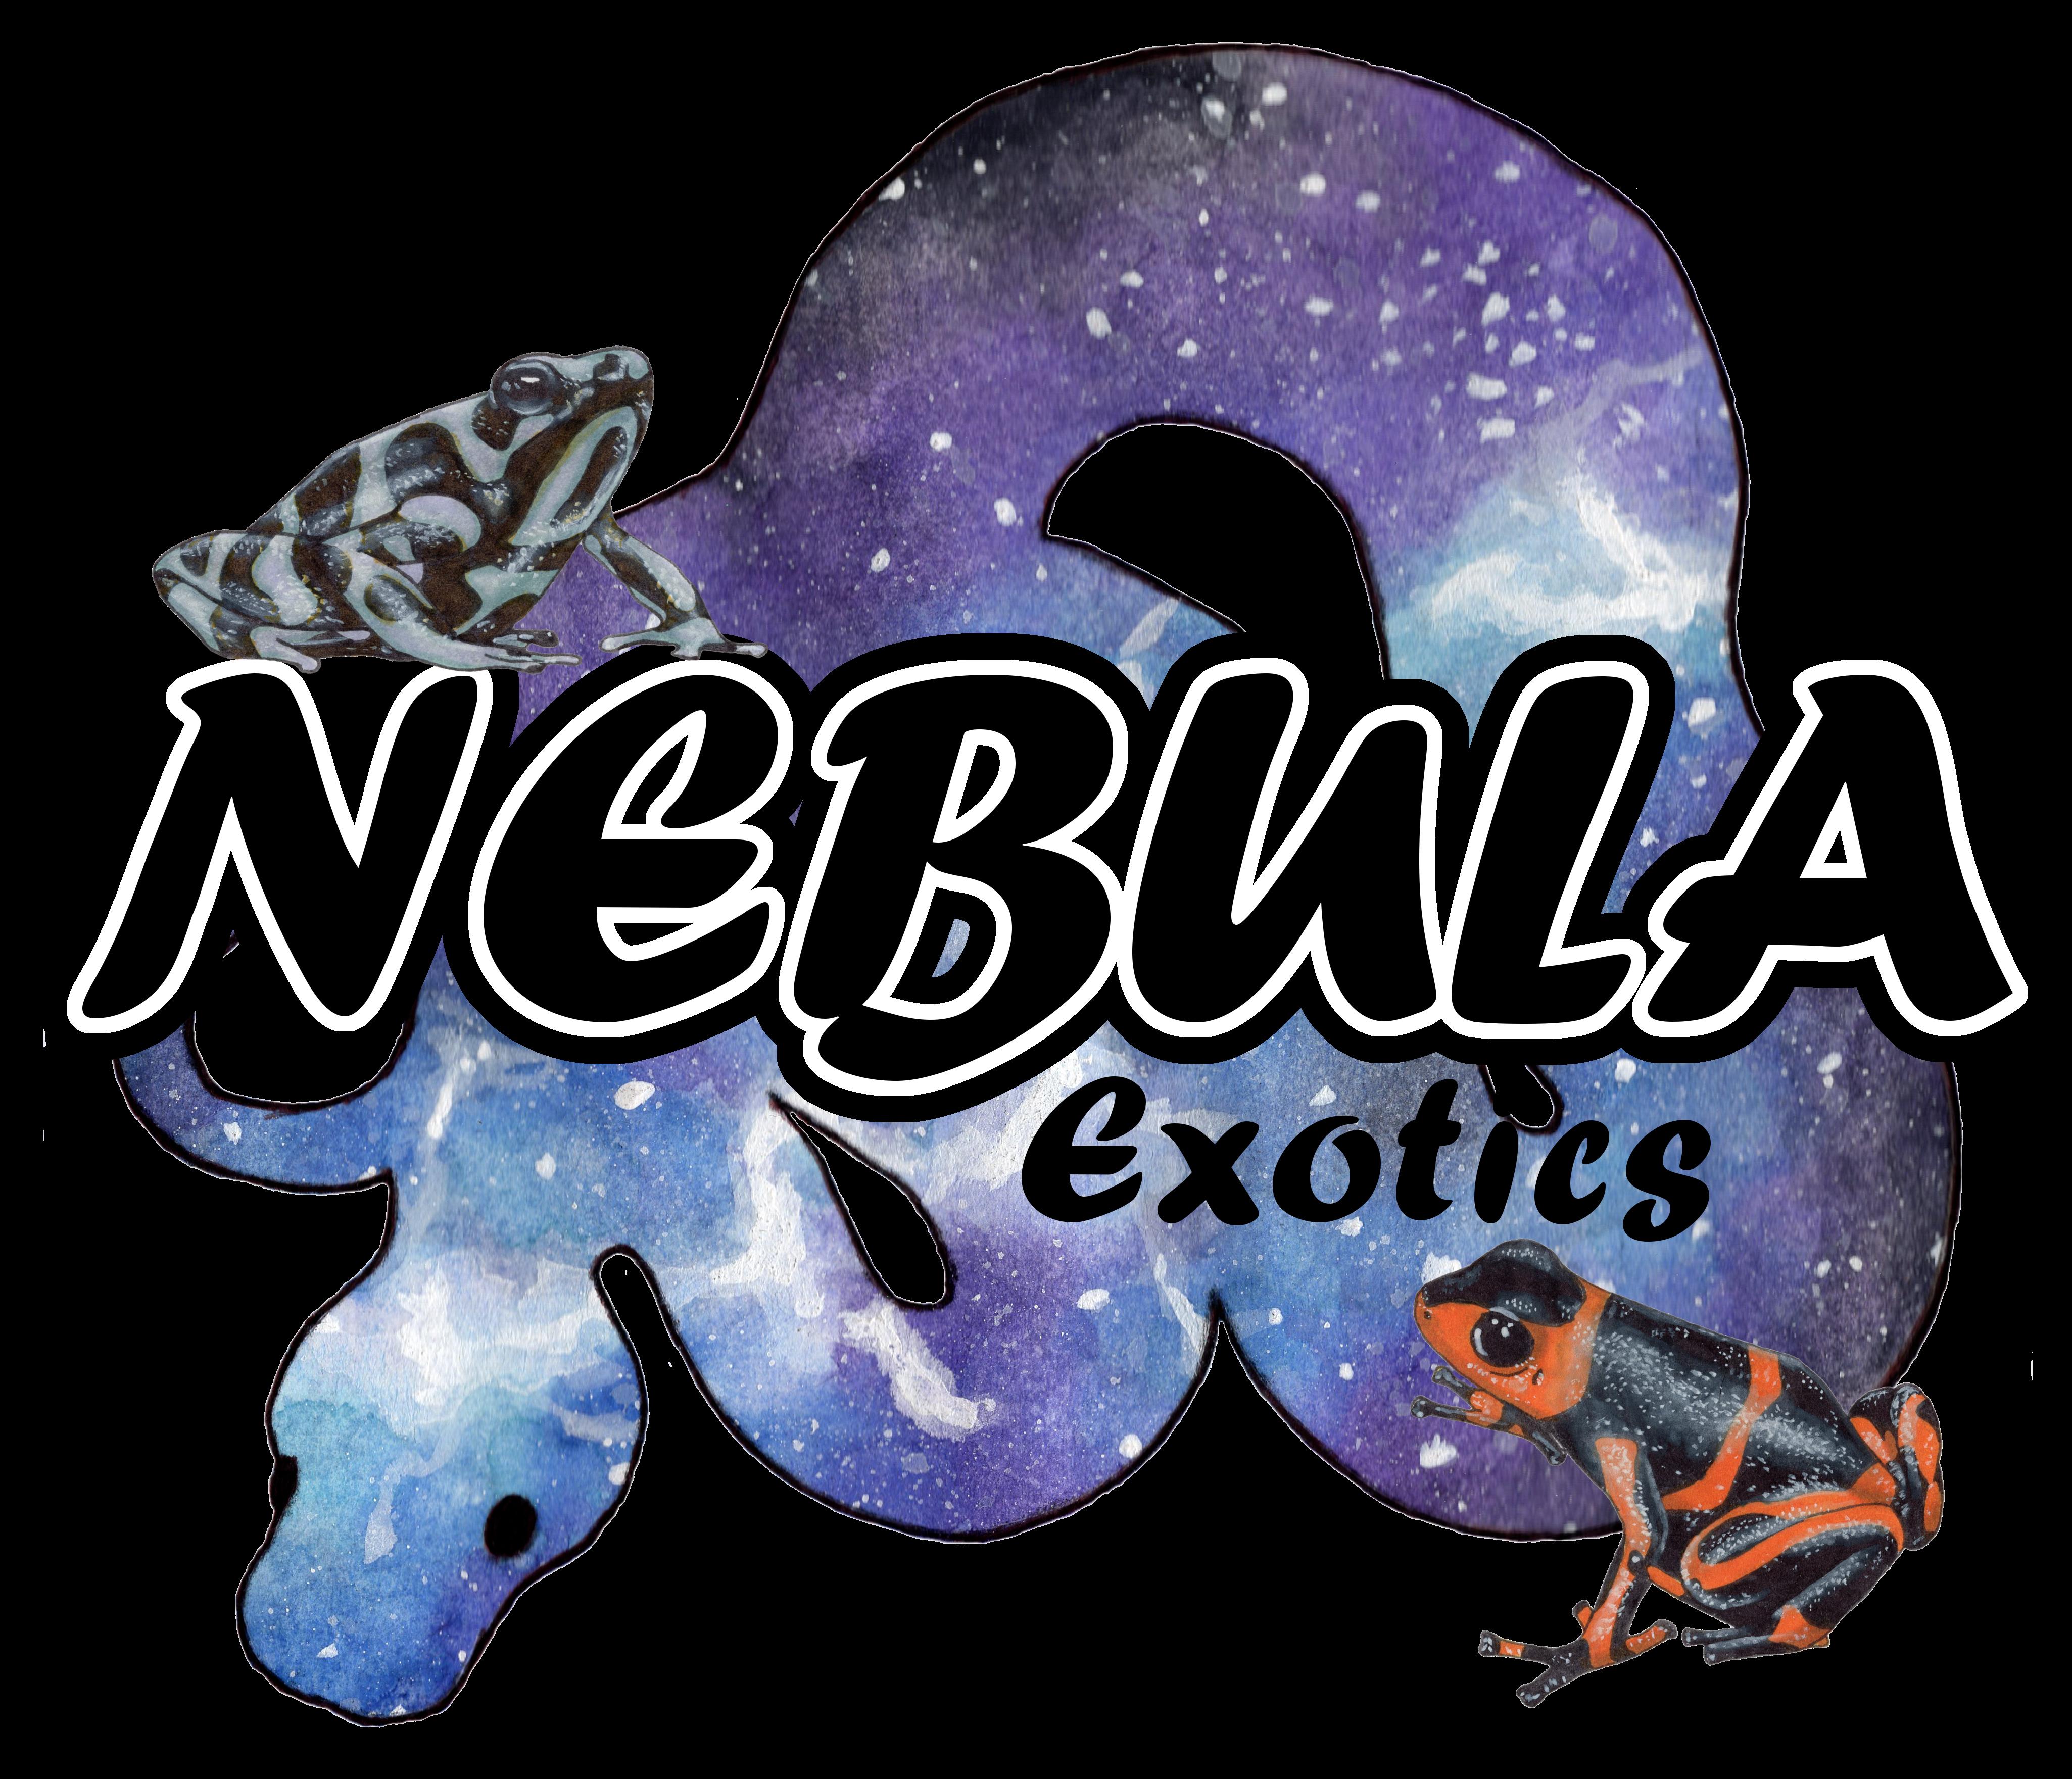 Nebula Exotics